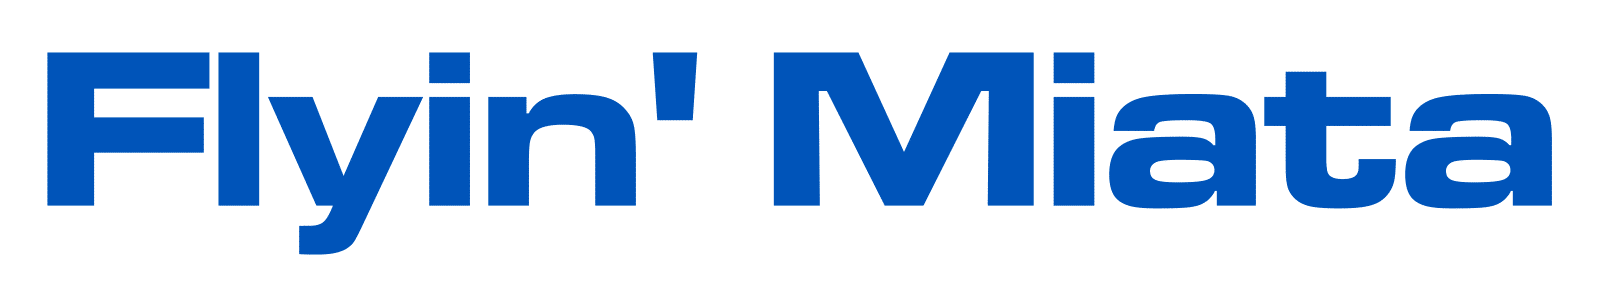 Flyin Miata Logo Larger